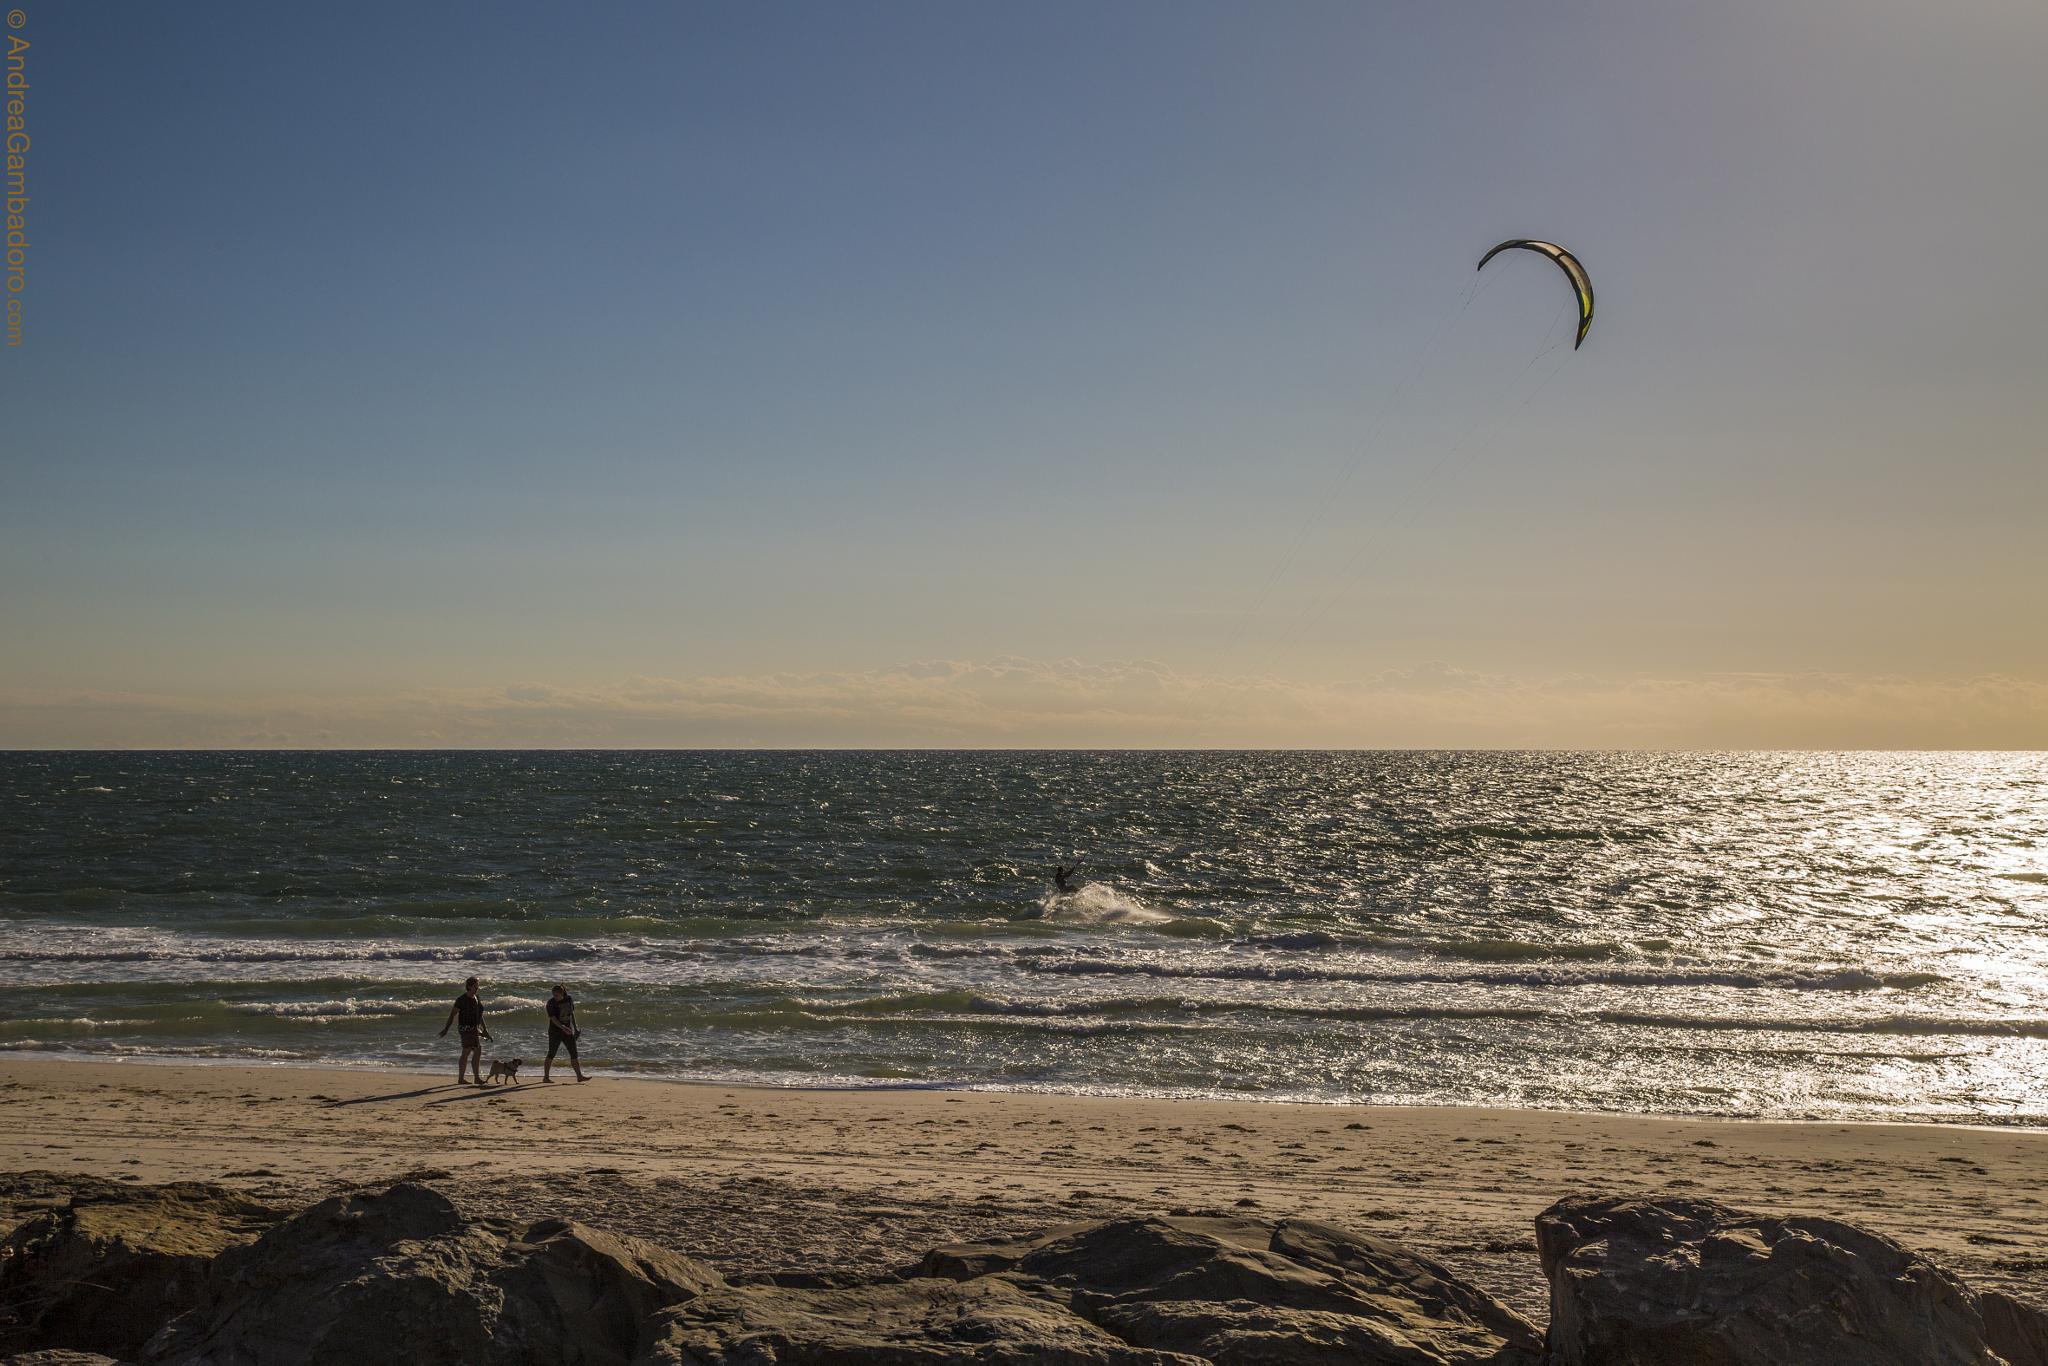 Adelaide's Beach by Andrea Gambadoro